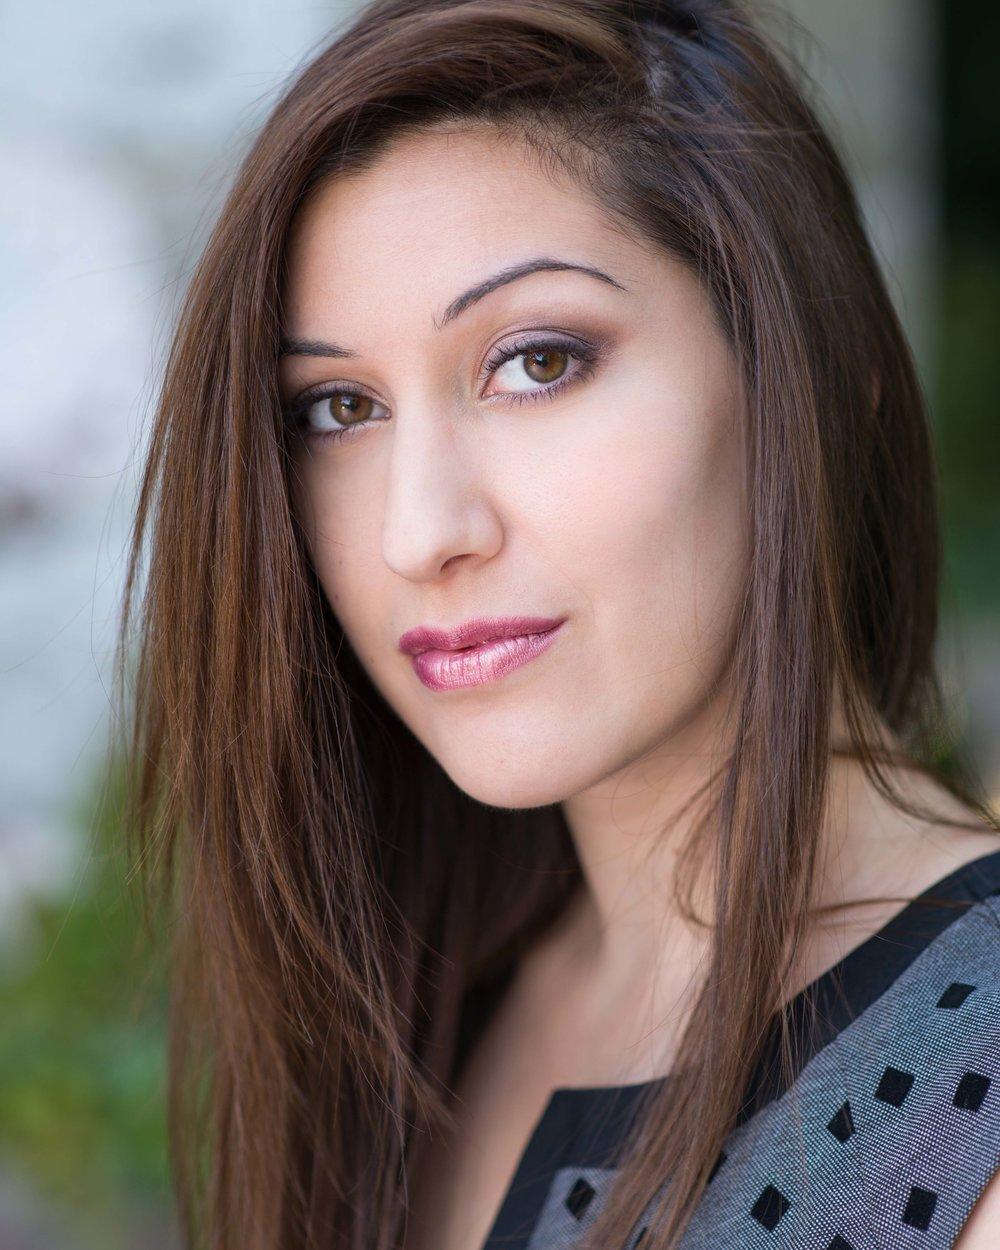 Tasha Meisami-Farivar